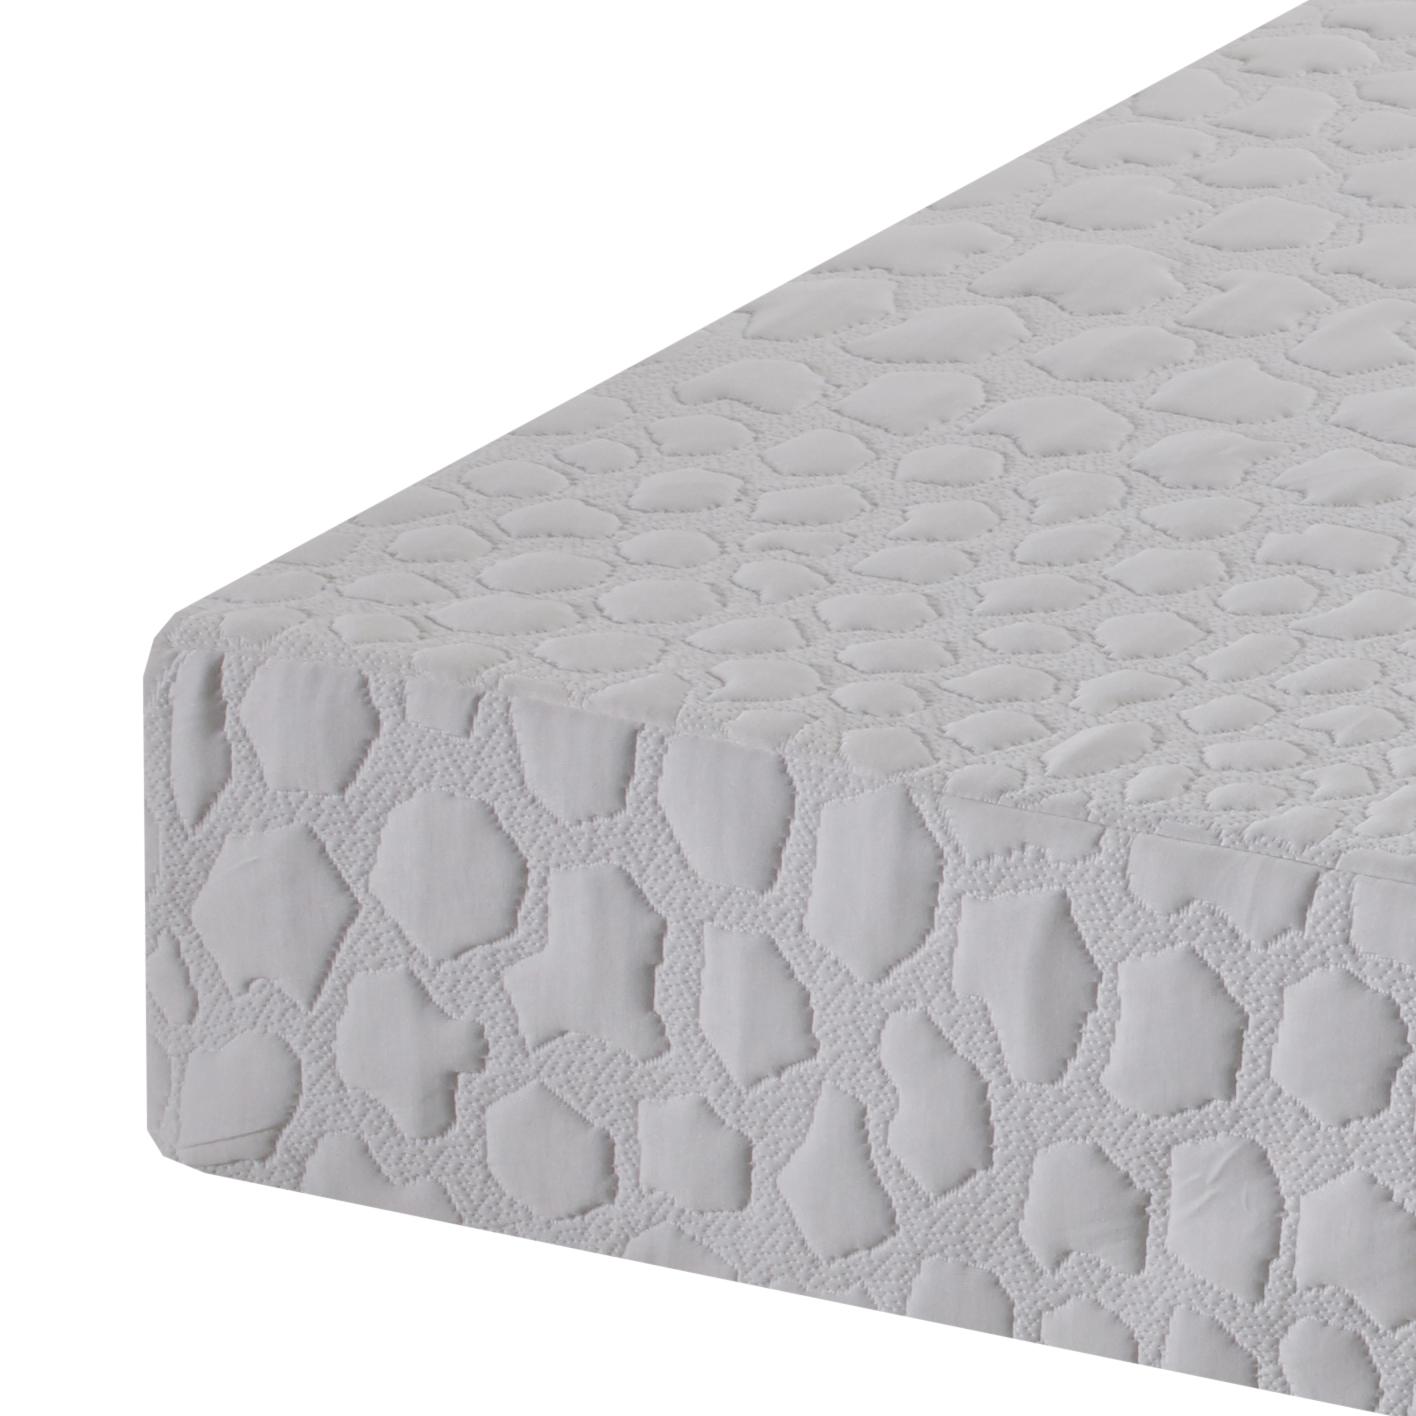 Pureflex Pluto Memory Foam Certipur Nbf Mattress The Cheapest Mattress